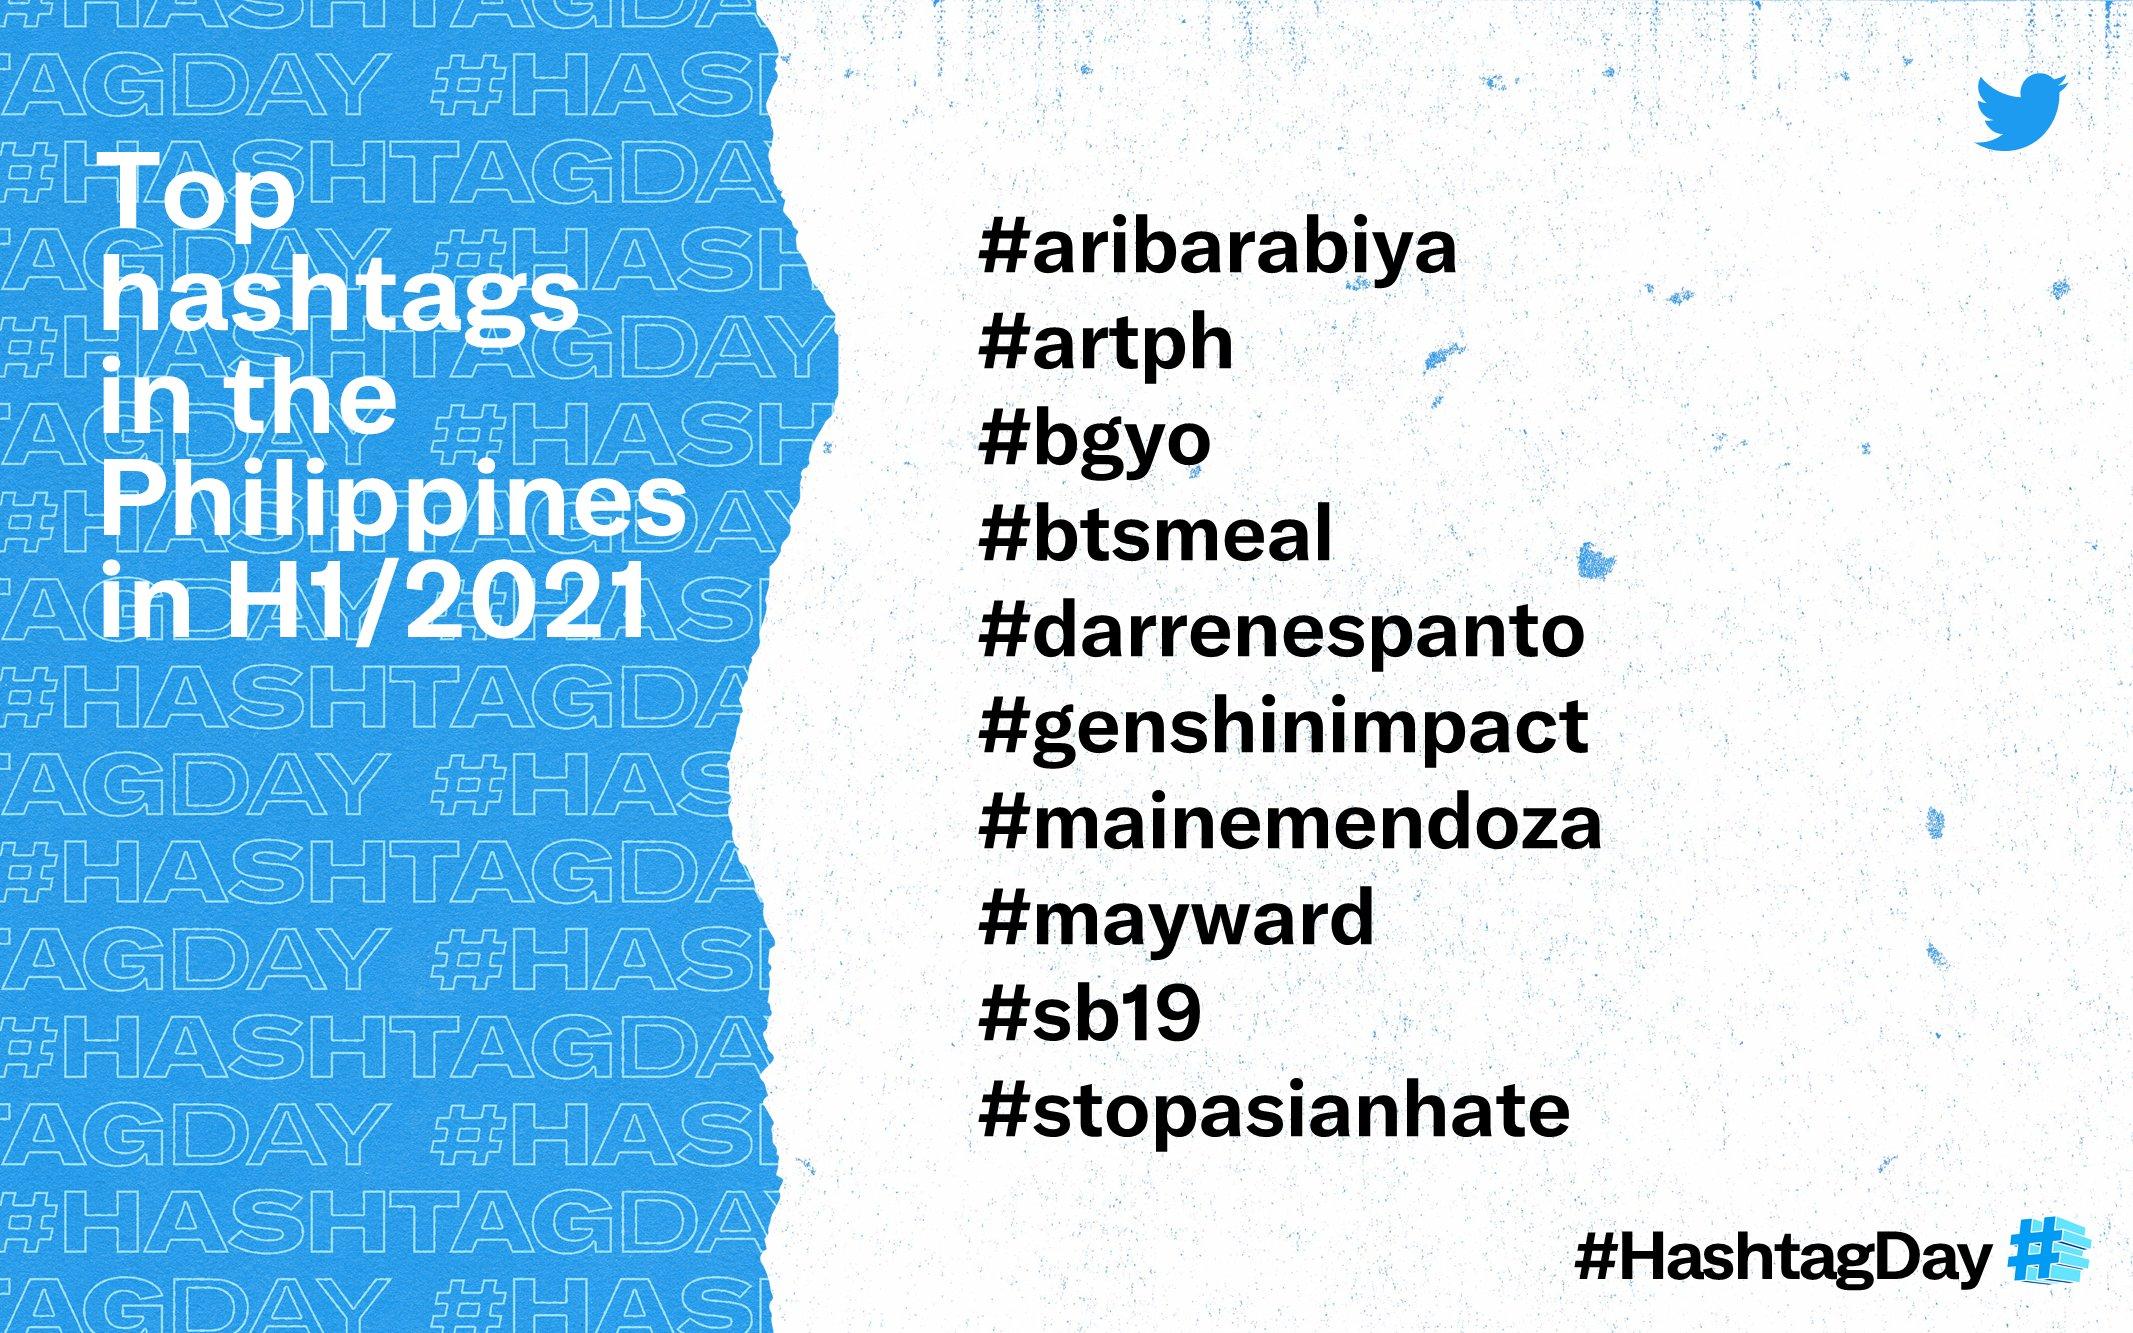 hashtag, <b> Rabiya Mateo is Filipino Twitter&#8217;s most hashtagged topic in 2021 so far </b>